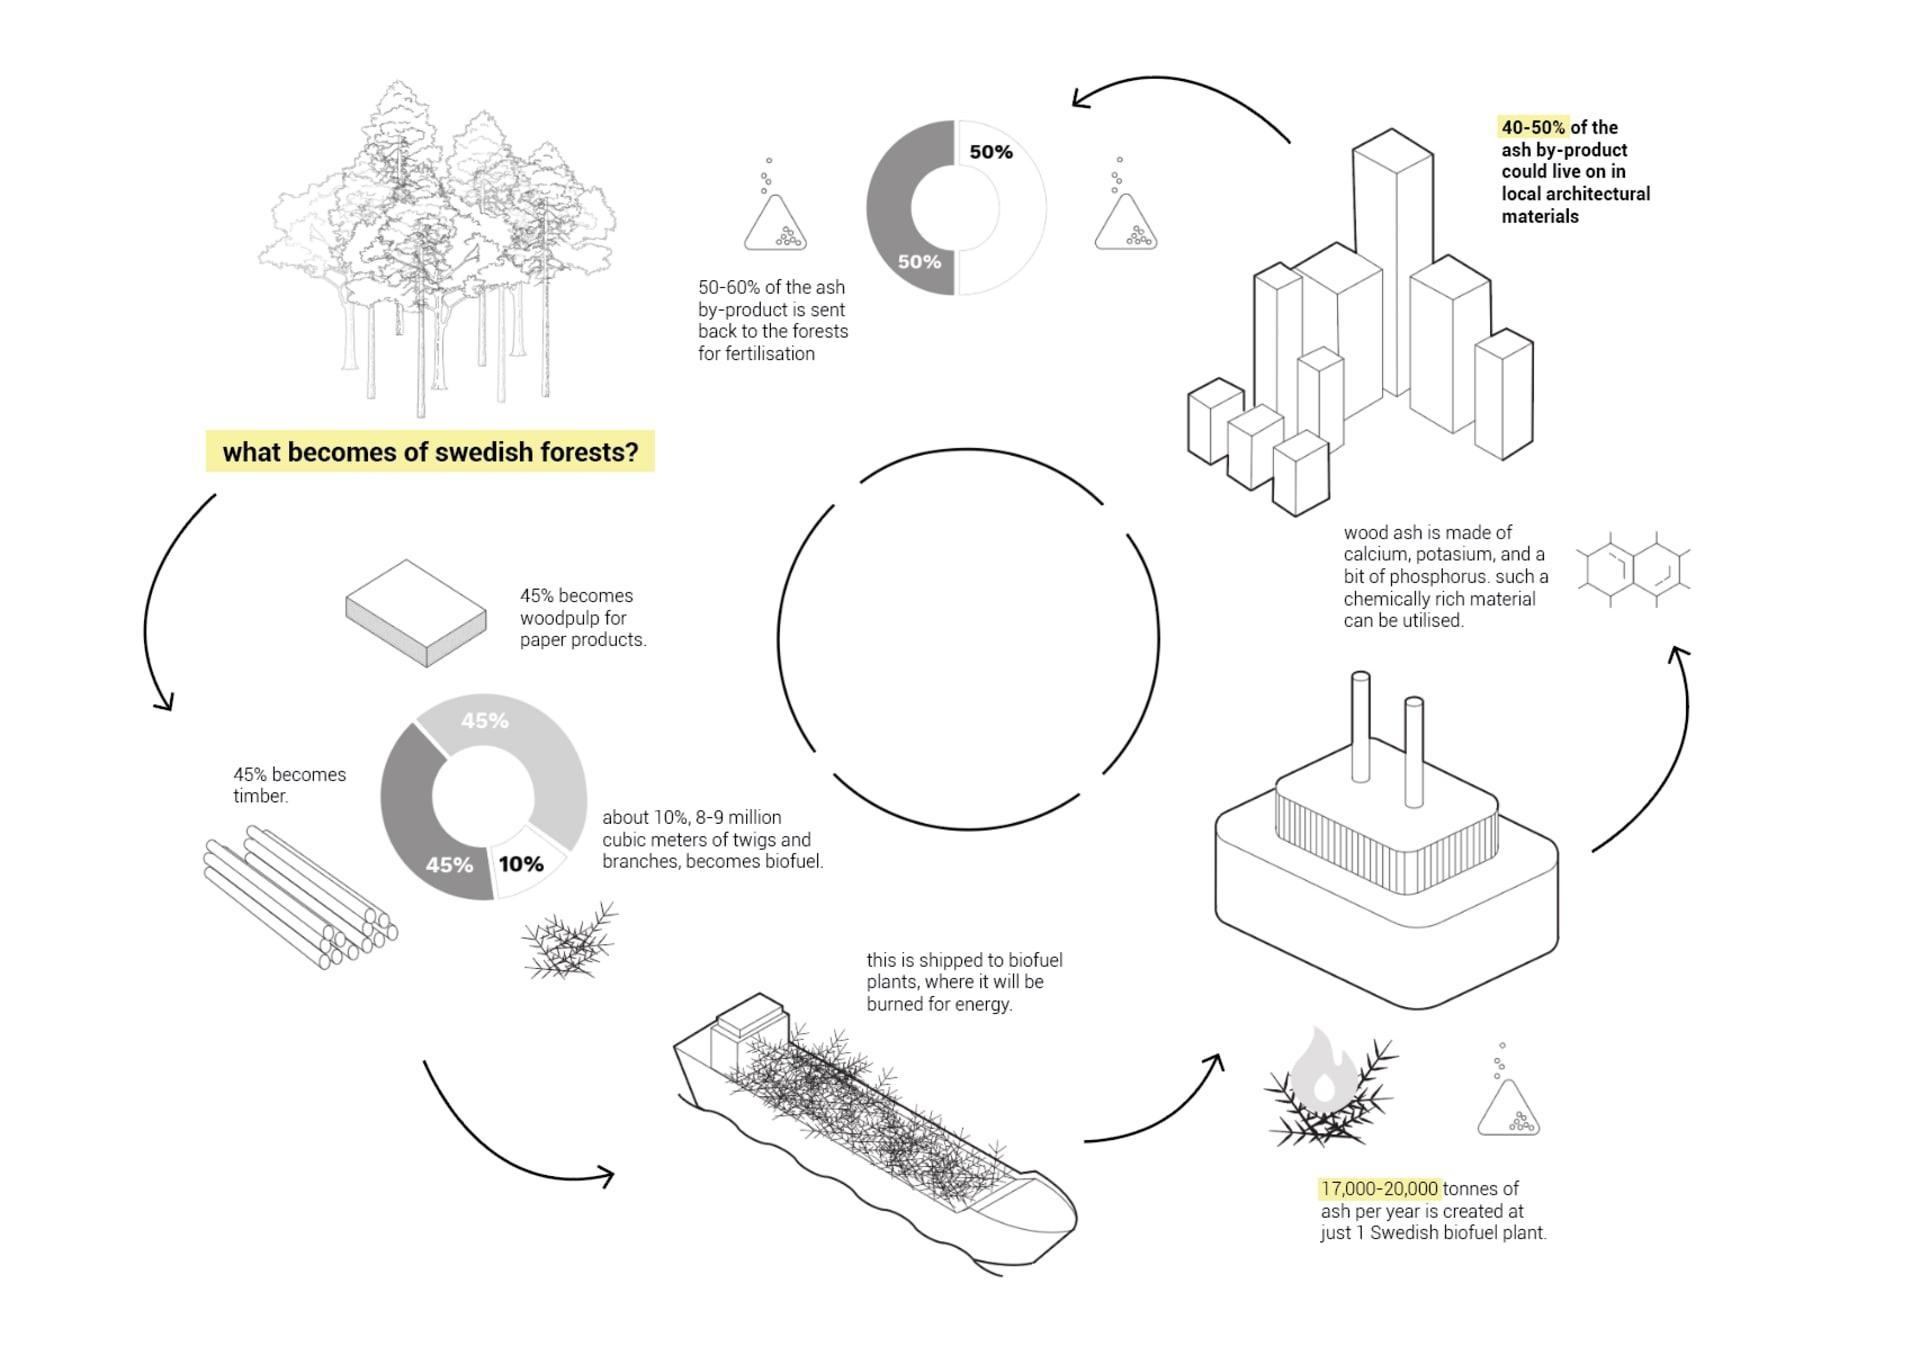 Wood ash cycle